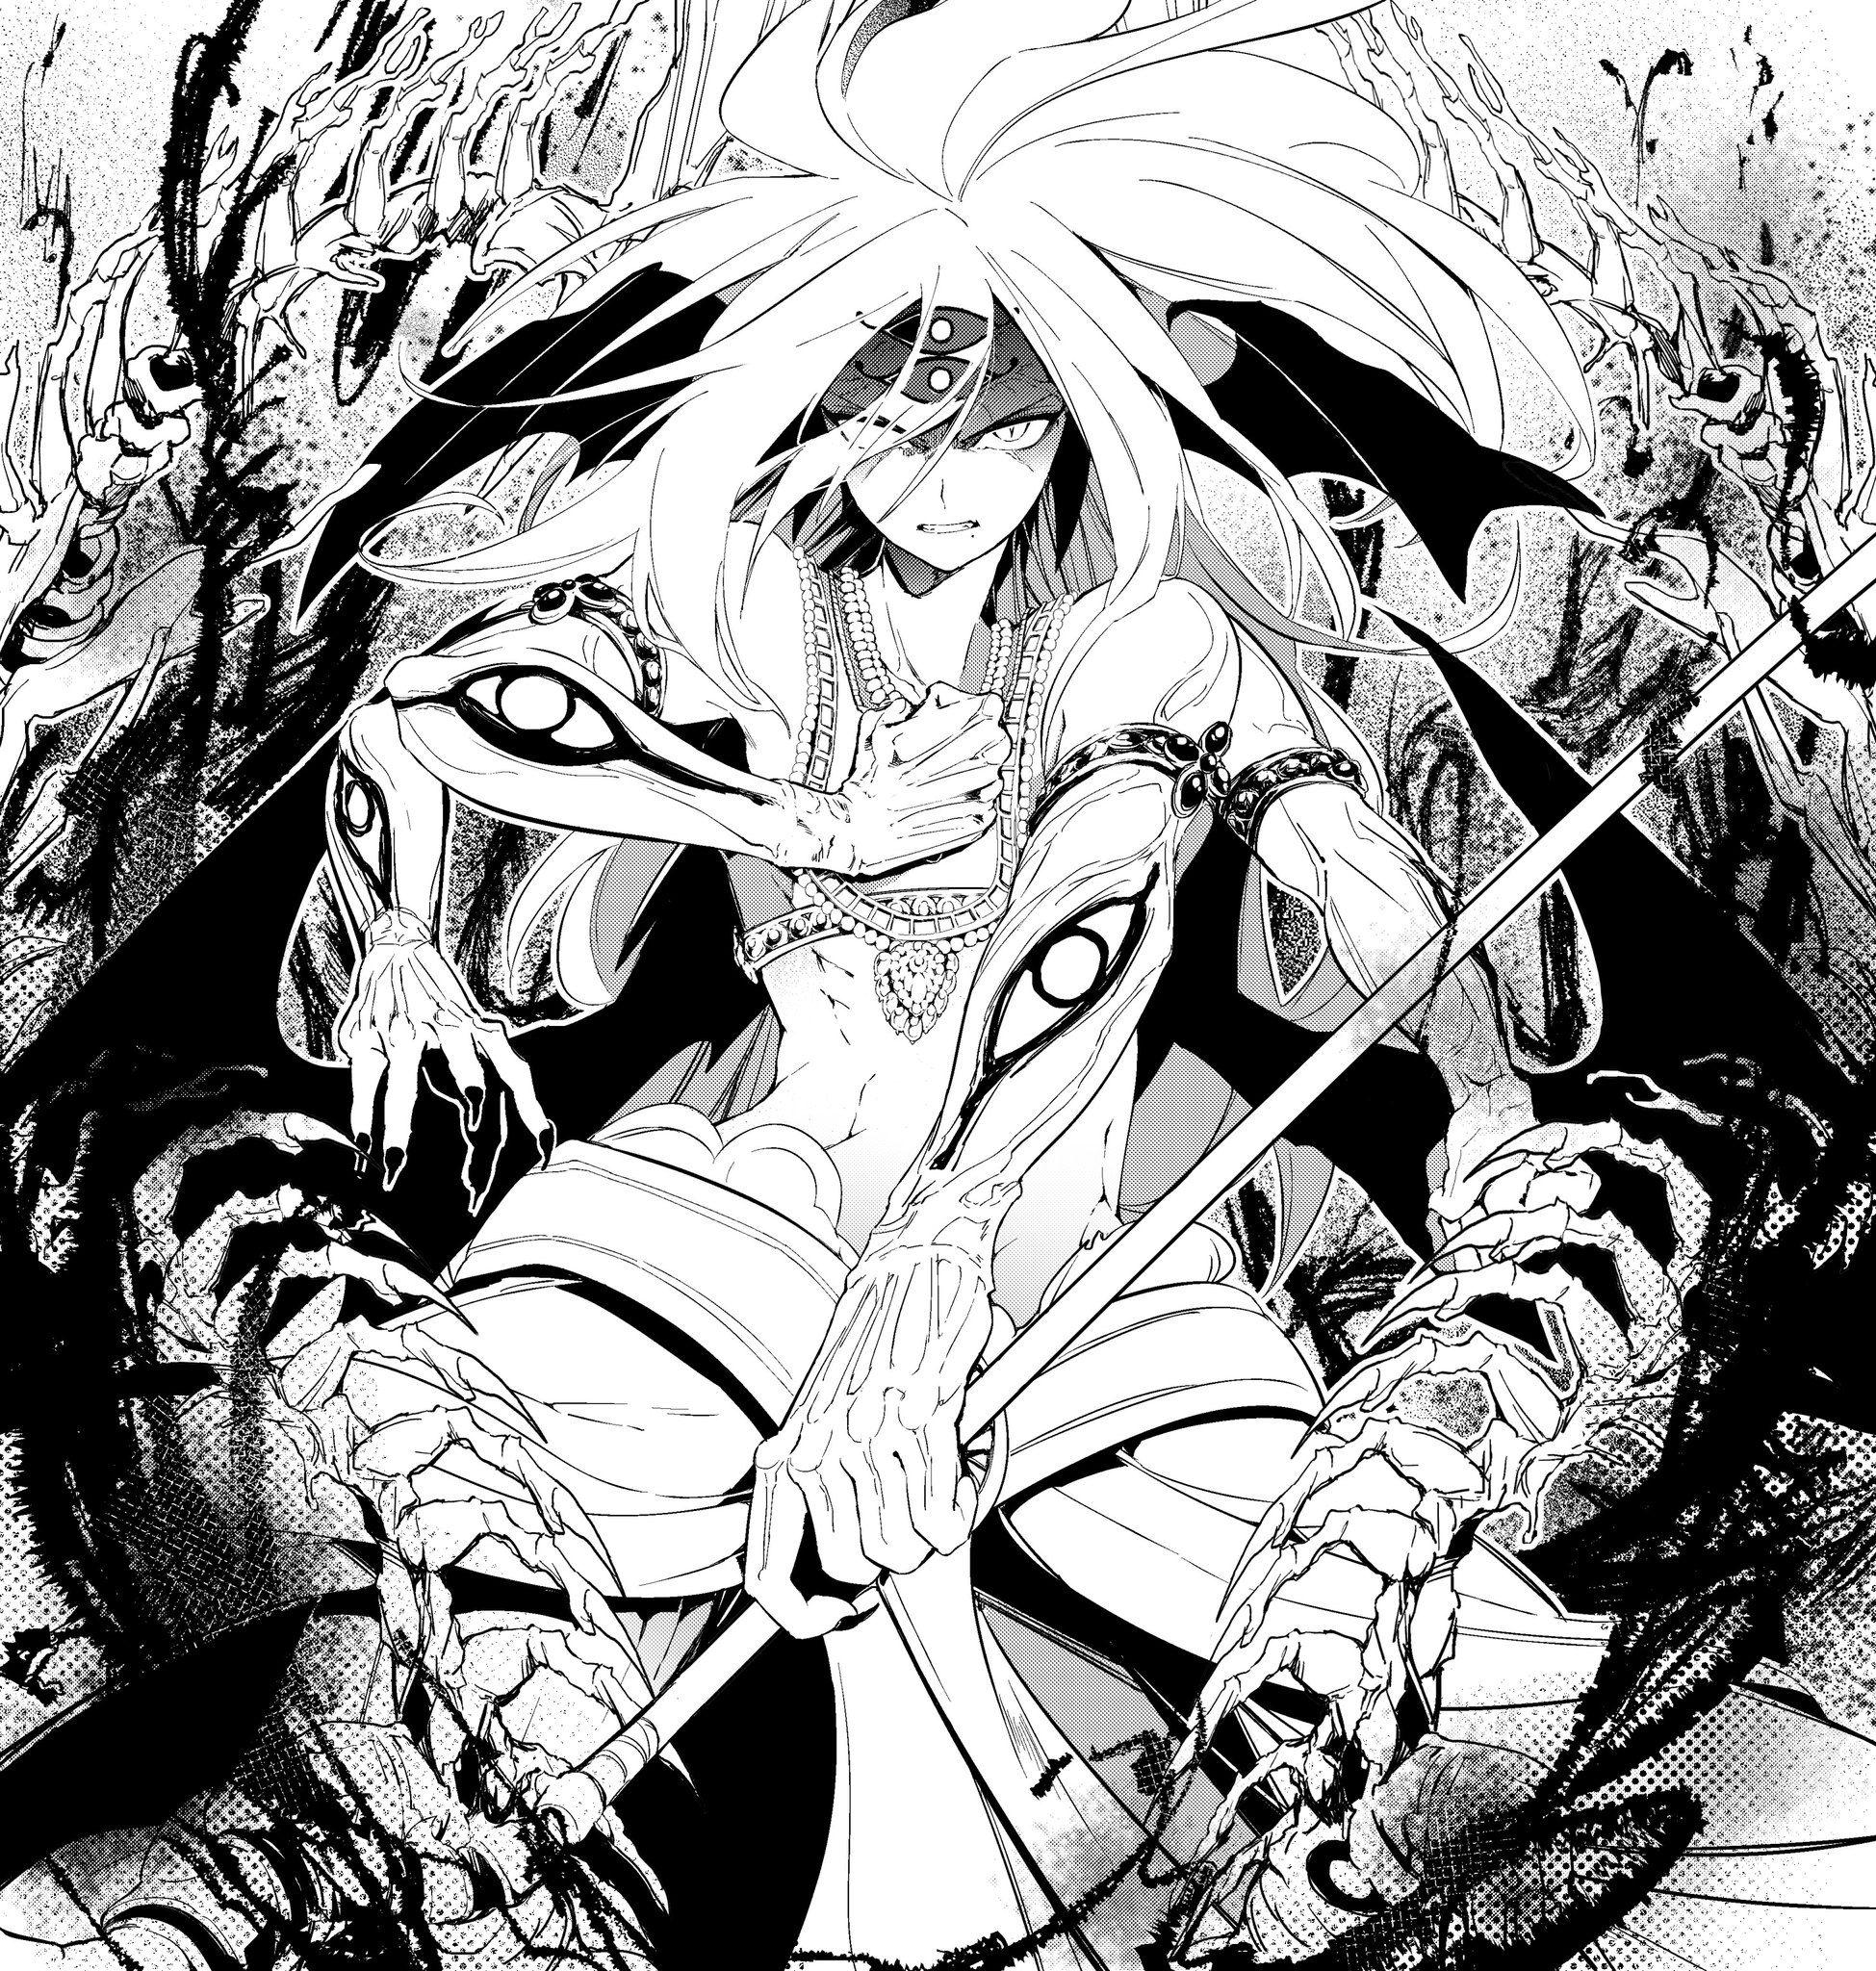 Hakuryuu Ren Magi The Labyrinth of Magic